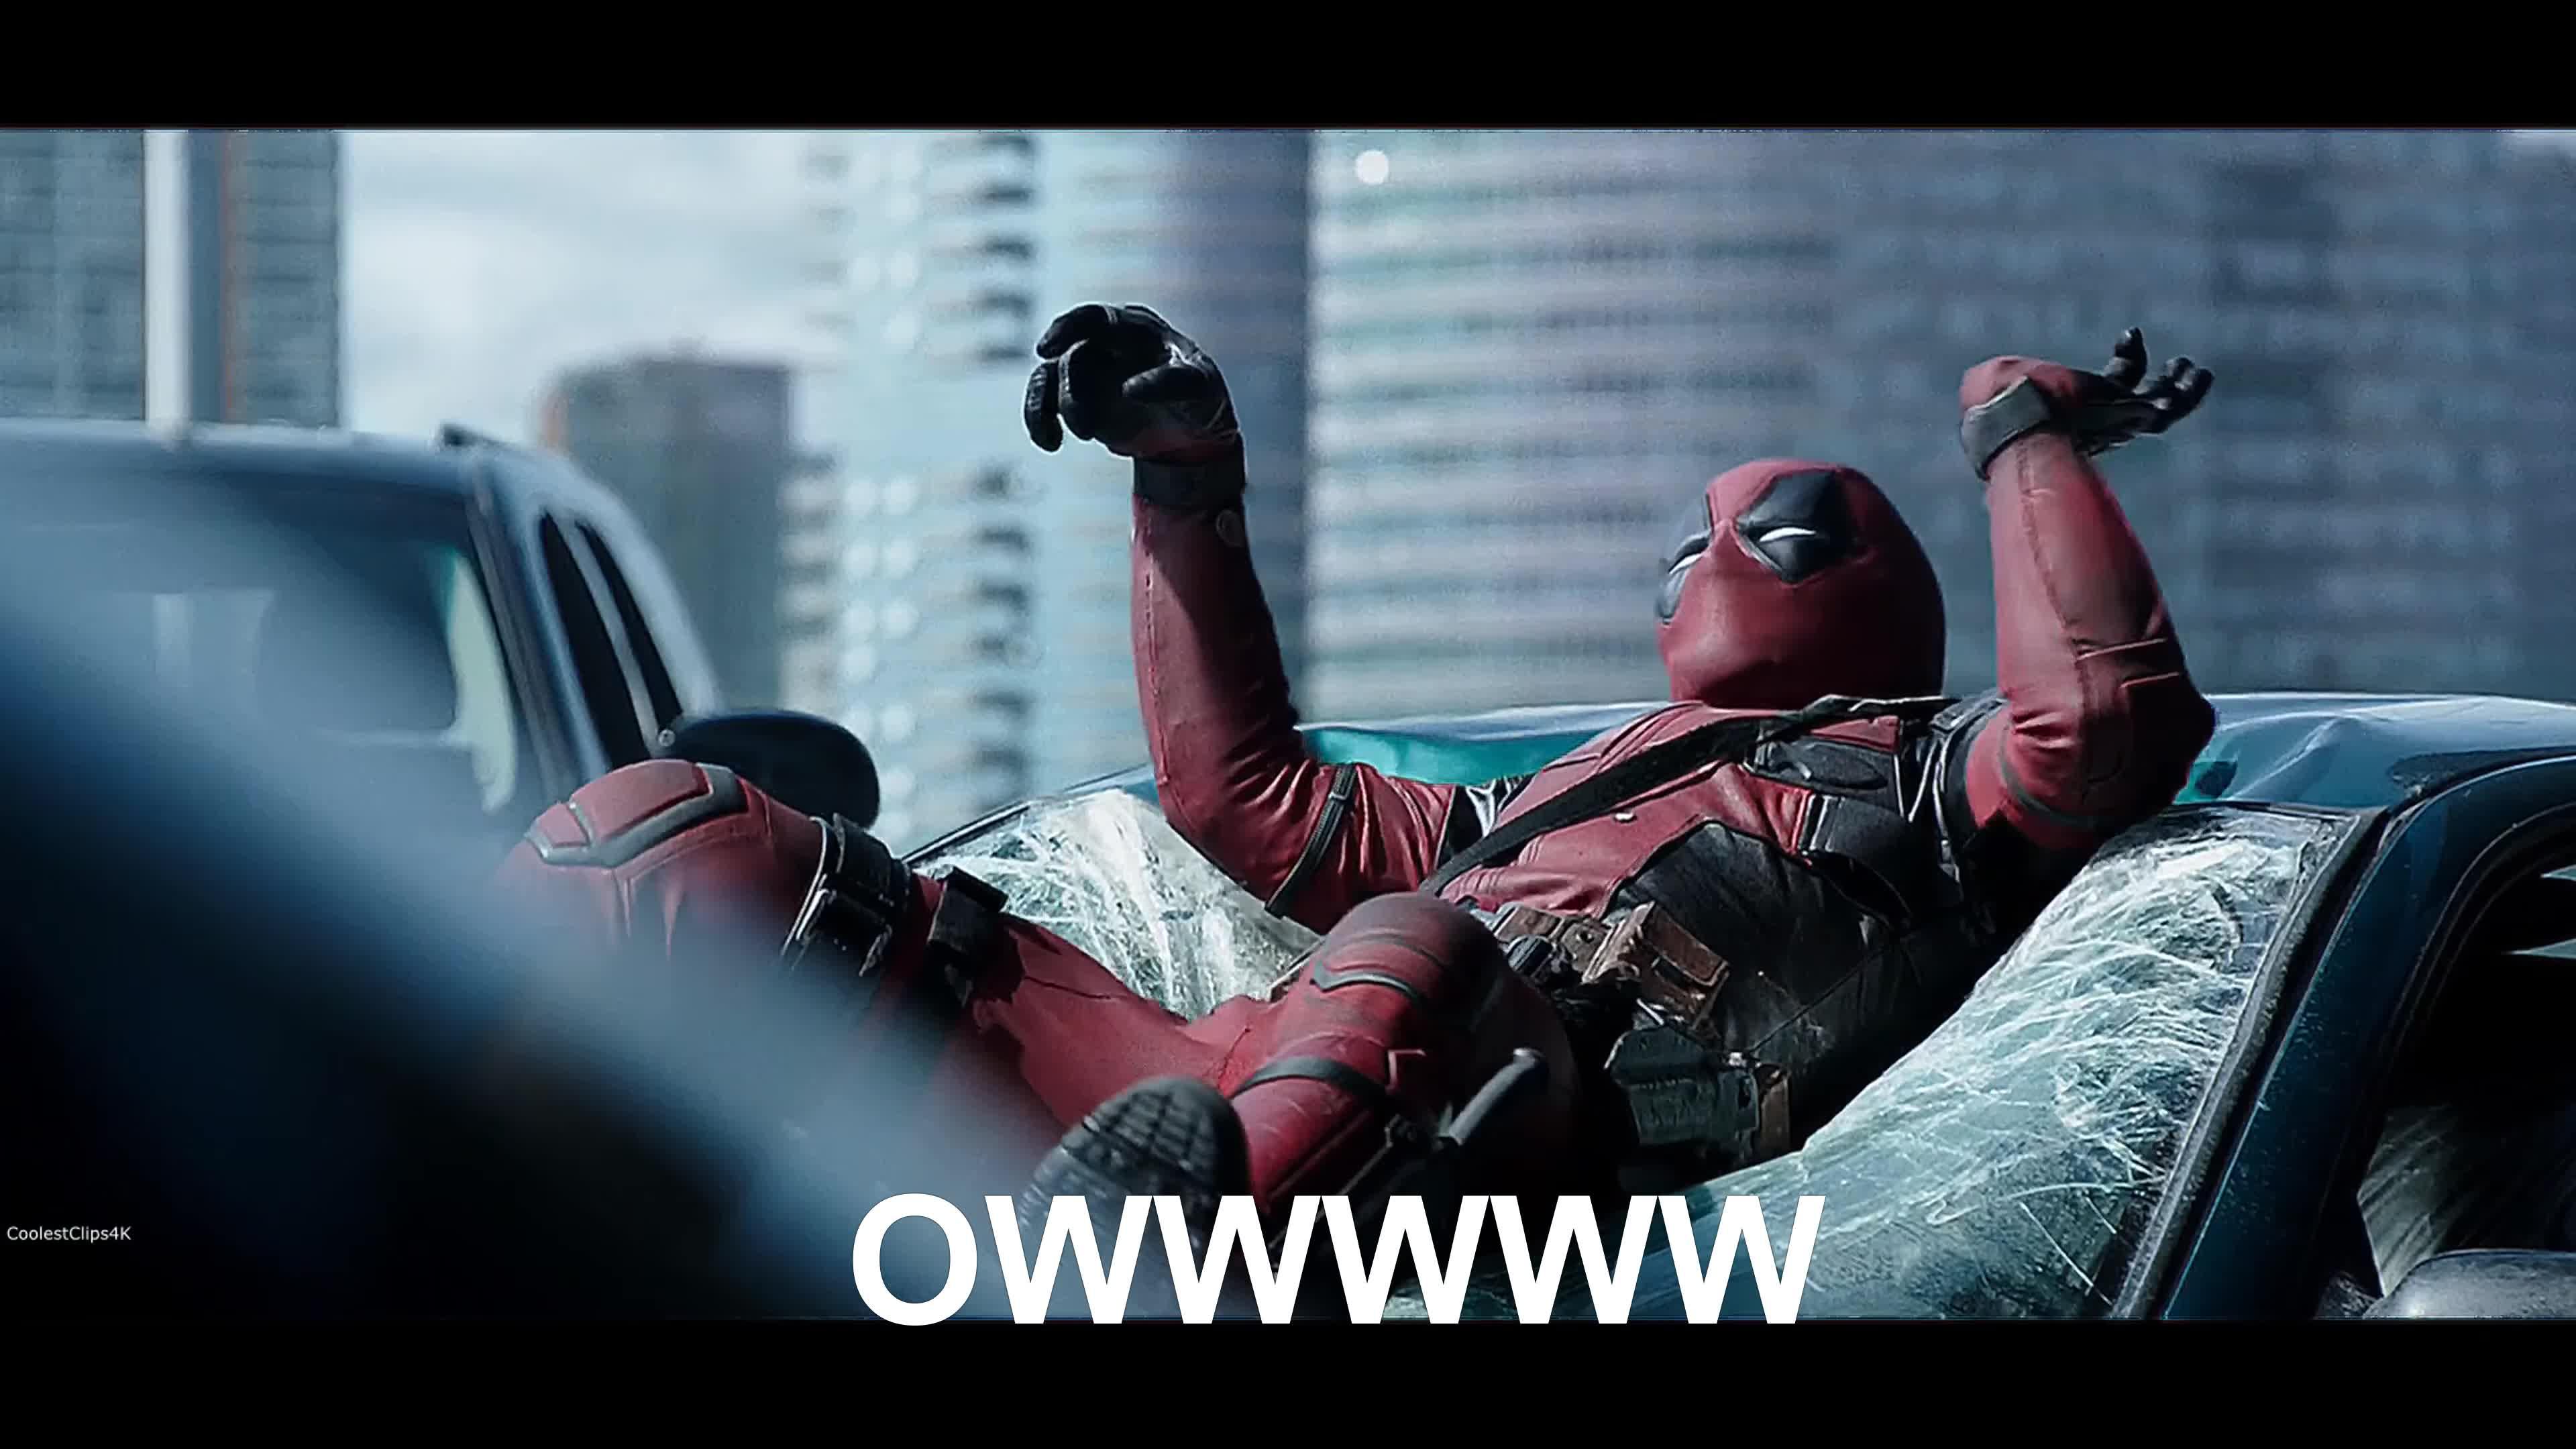 1080p, Colossus, Deadpool, Deadpool 2016, Deadpool Hand Cut Off Scene, Deadpool vs Colossus, HD, Hand Cutting Scene, InstantMovieClips, Negasonic Teenage Warhead, Deadpool Hand Cut Off Scene ¦ Deadpool 2016 Movie CLIP 4K ULTRA HD GIFs